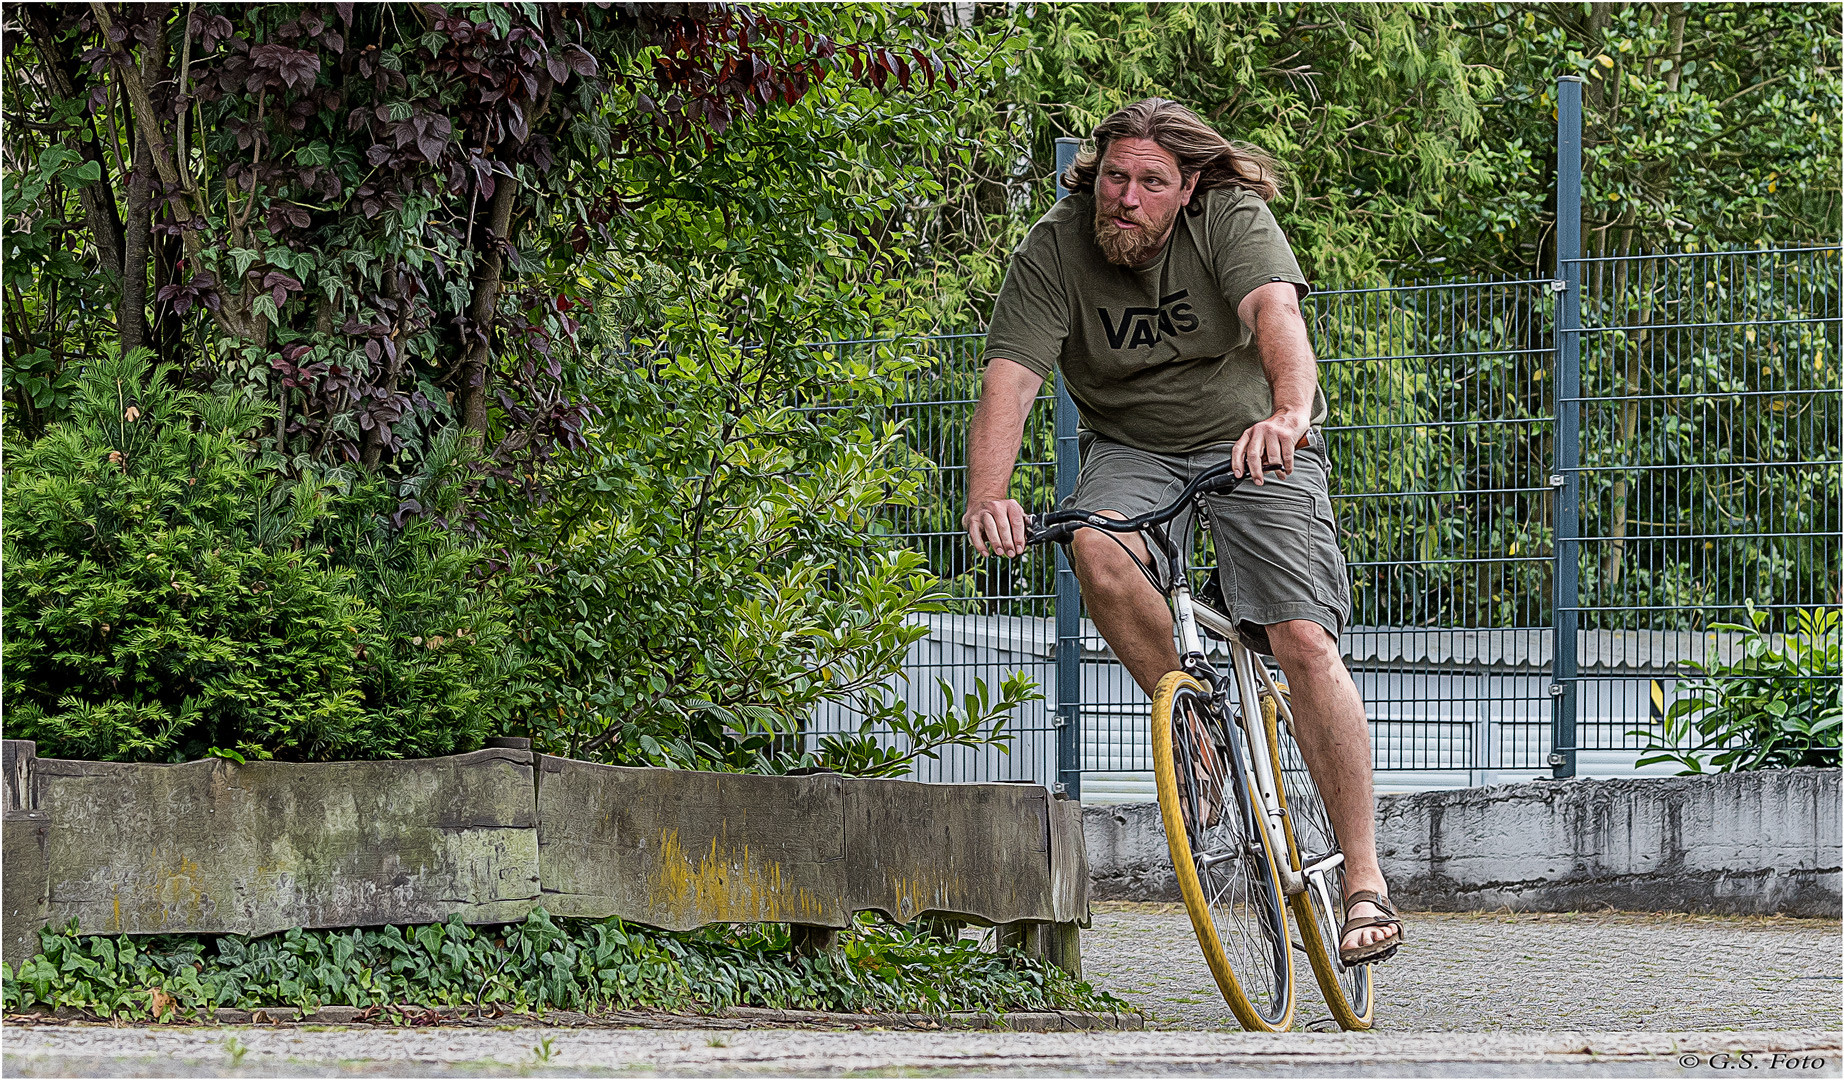 Flying Dutchman.........